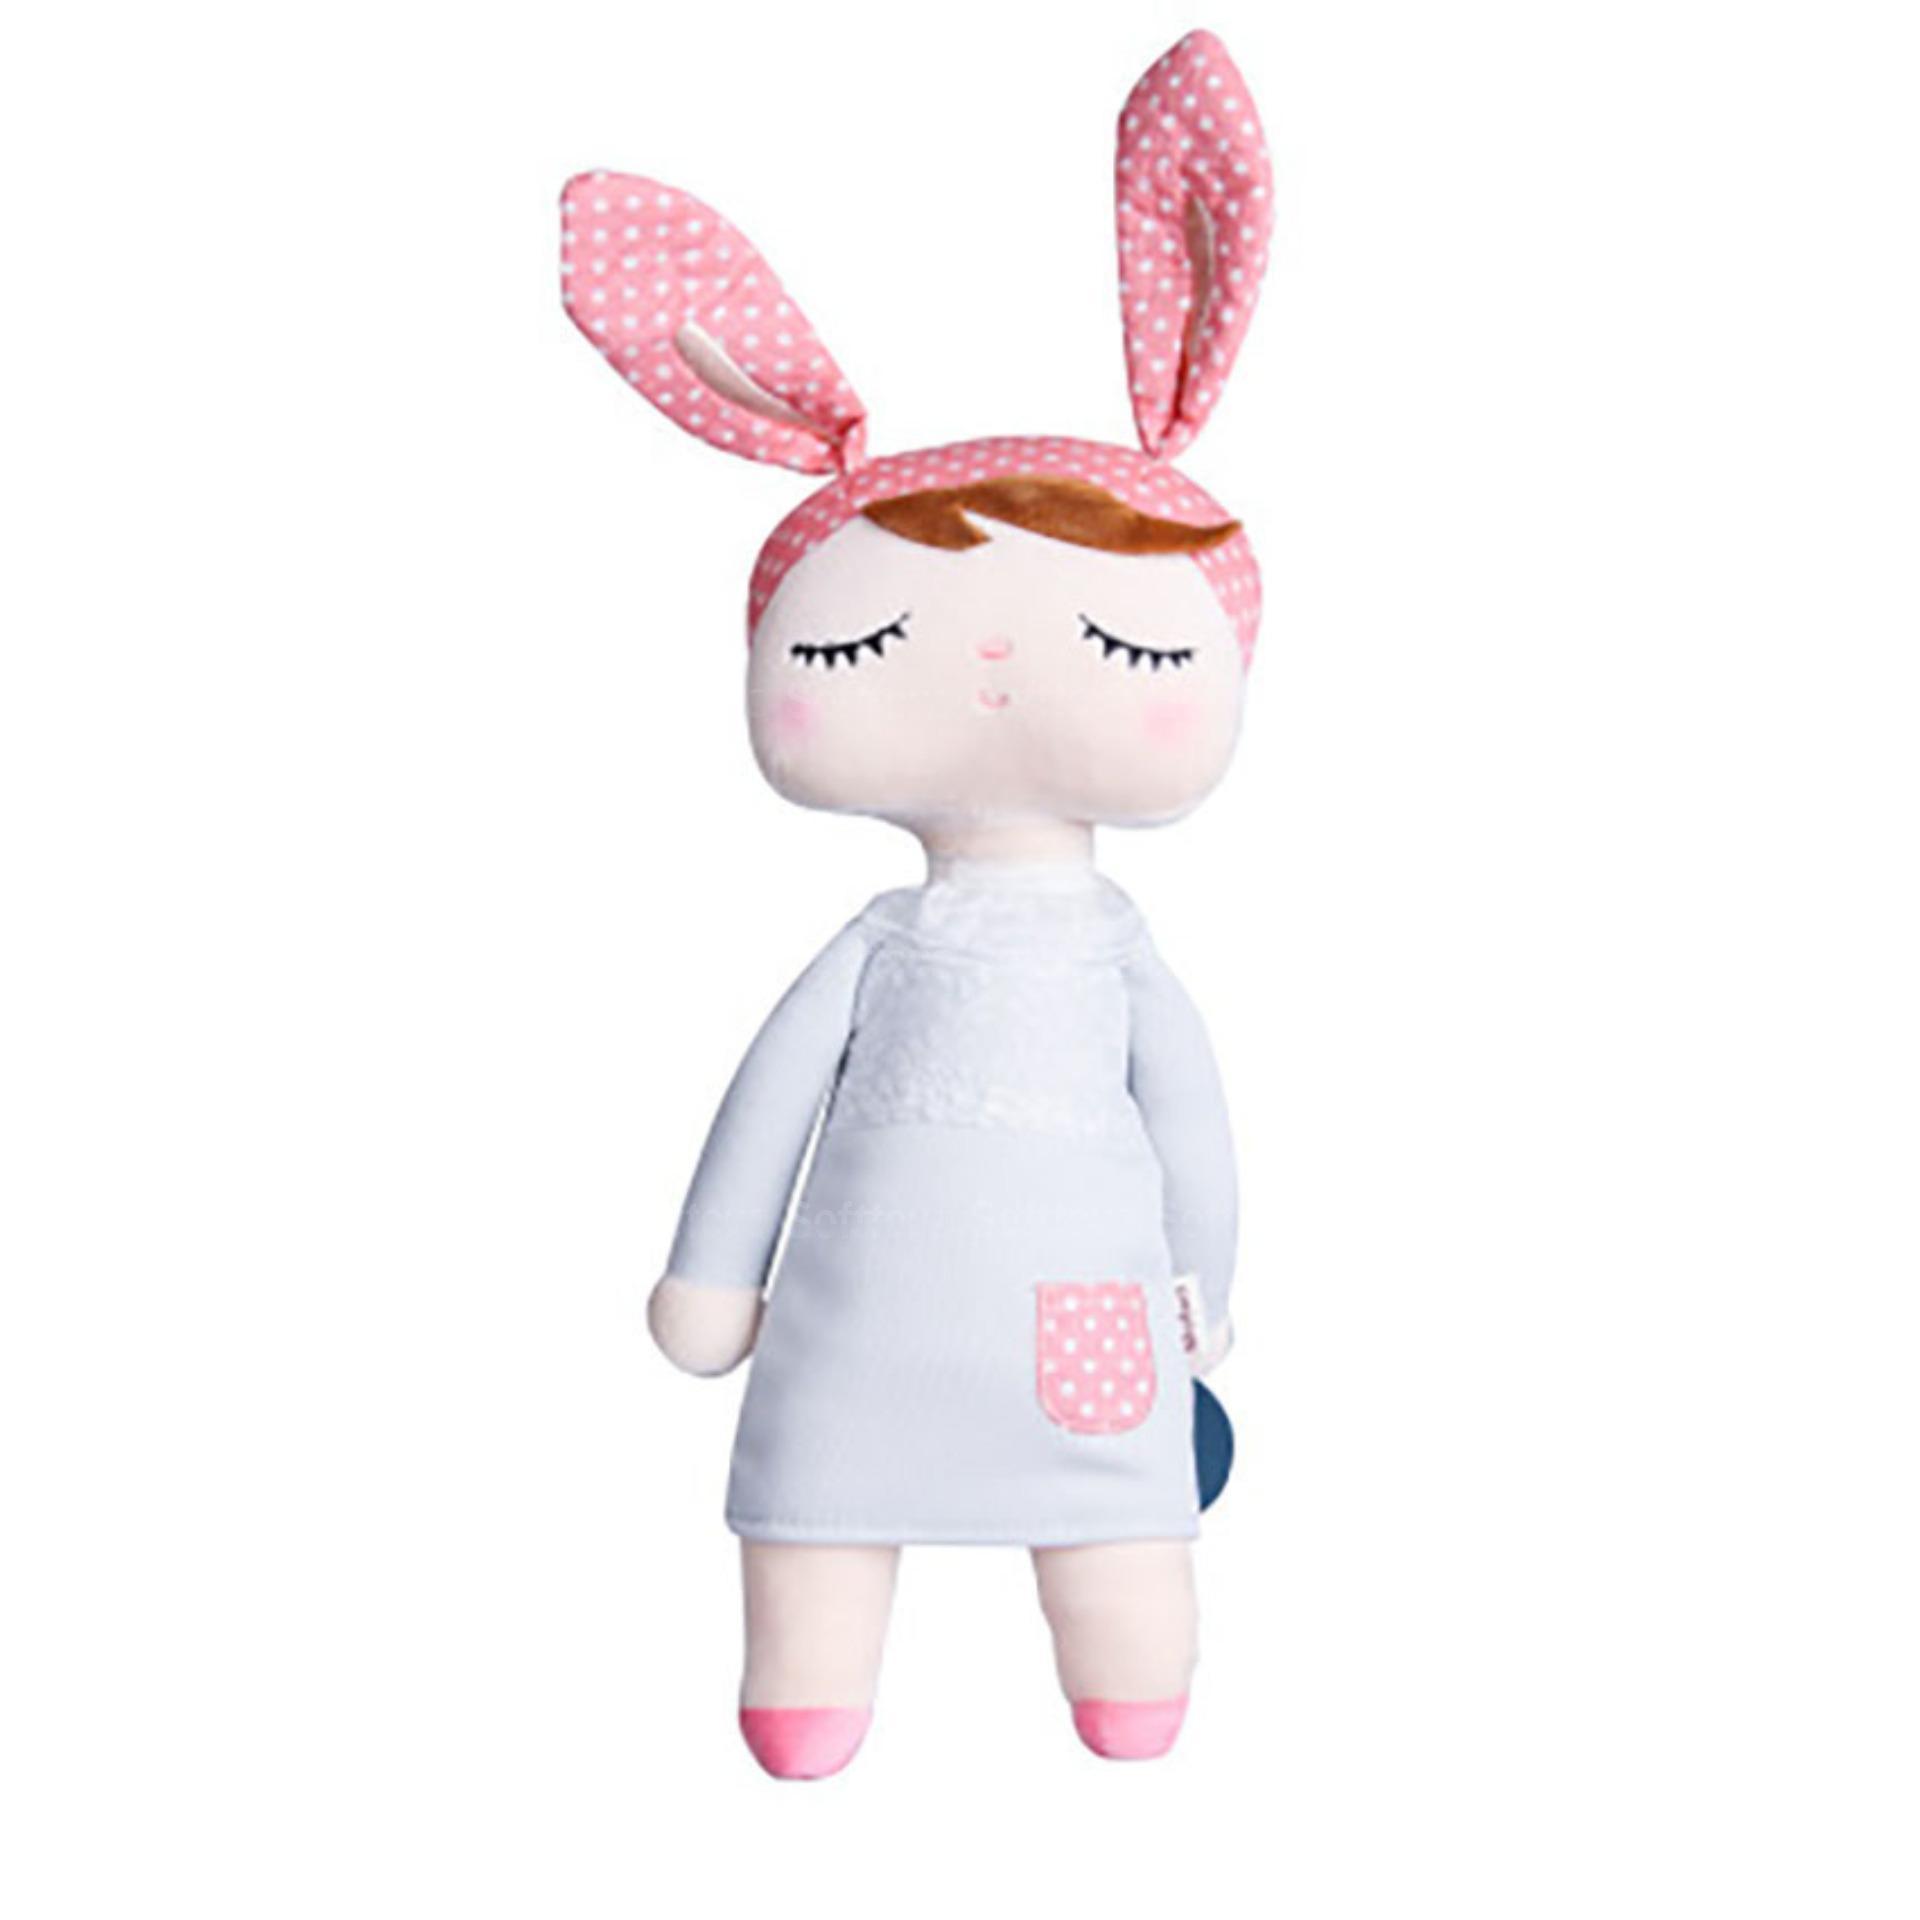 Мягкая игрушка-кукла Angela Gray dress